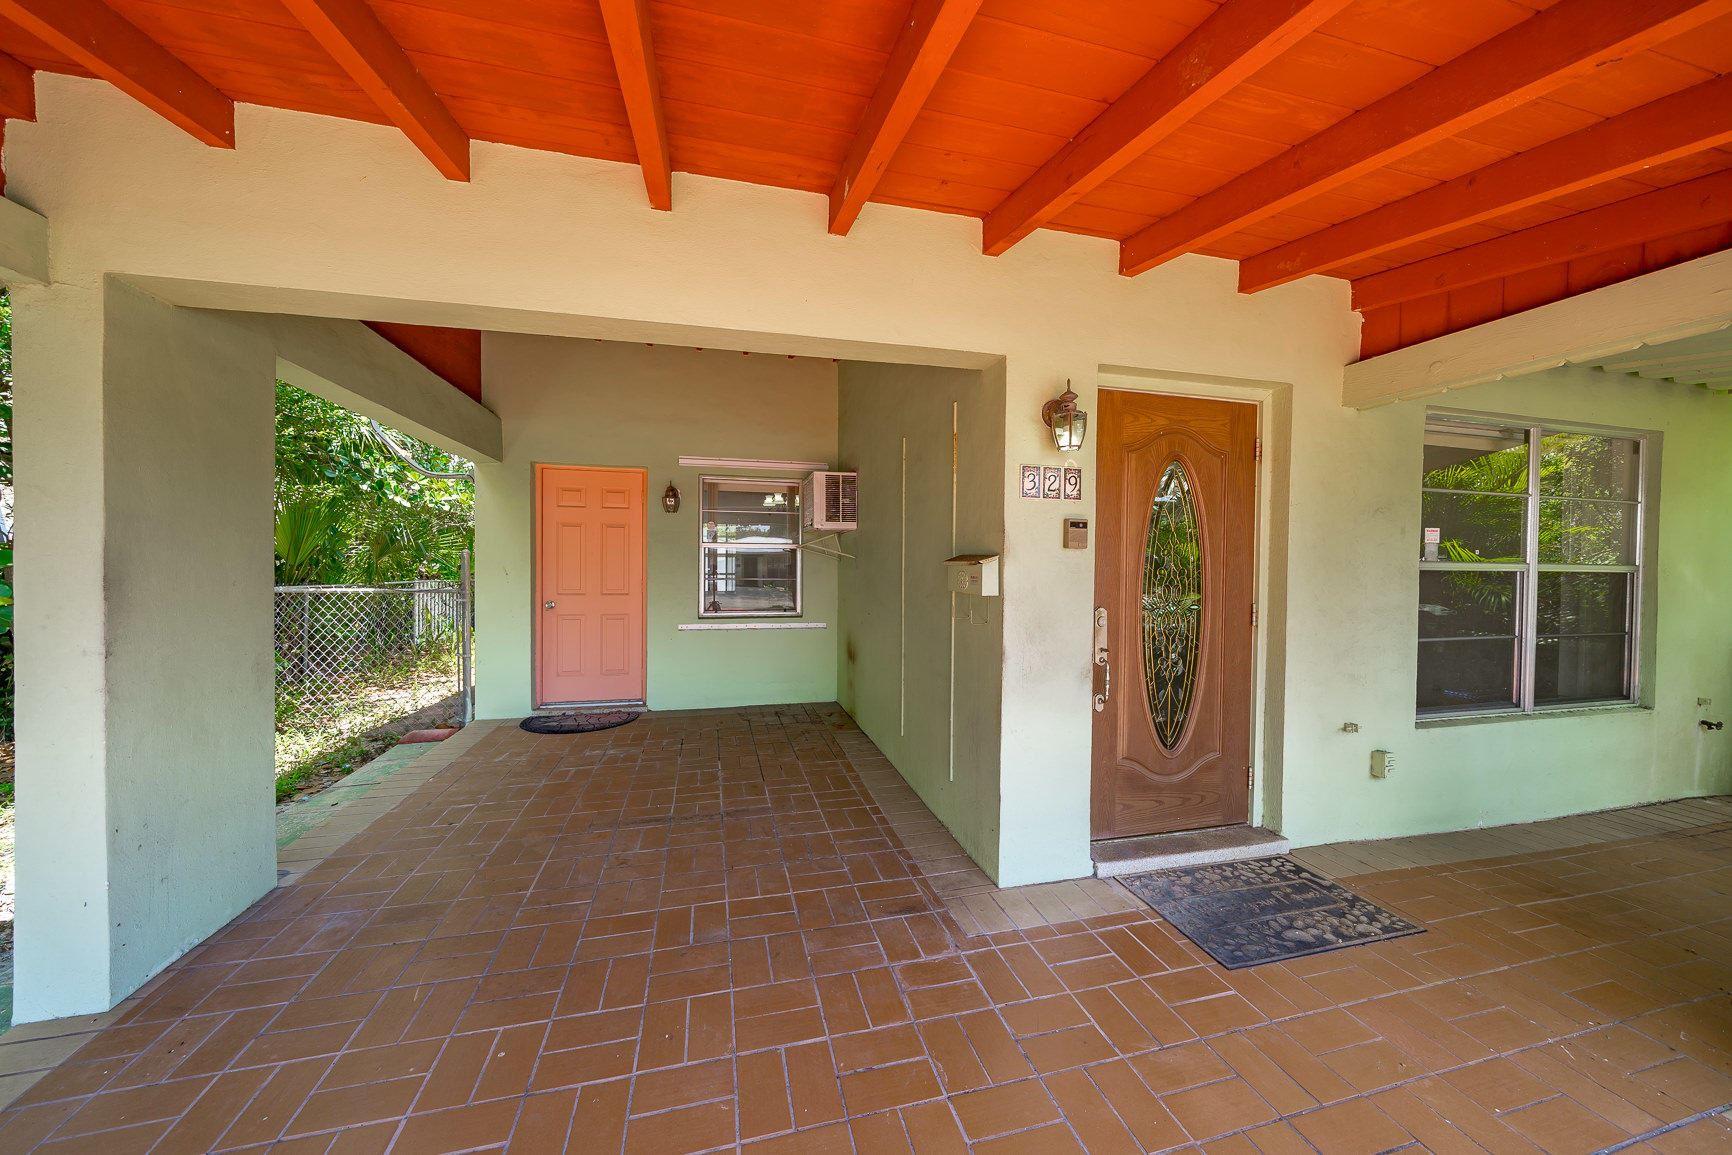 329 SW 2nd Street, Boca Raton, FL 33432 - MLS#: RX-10721069